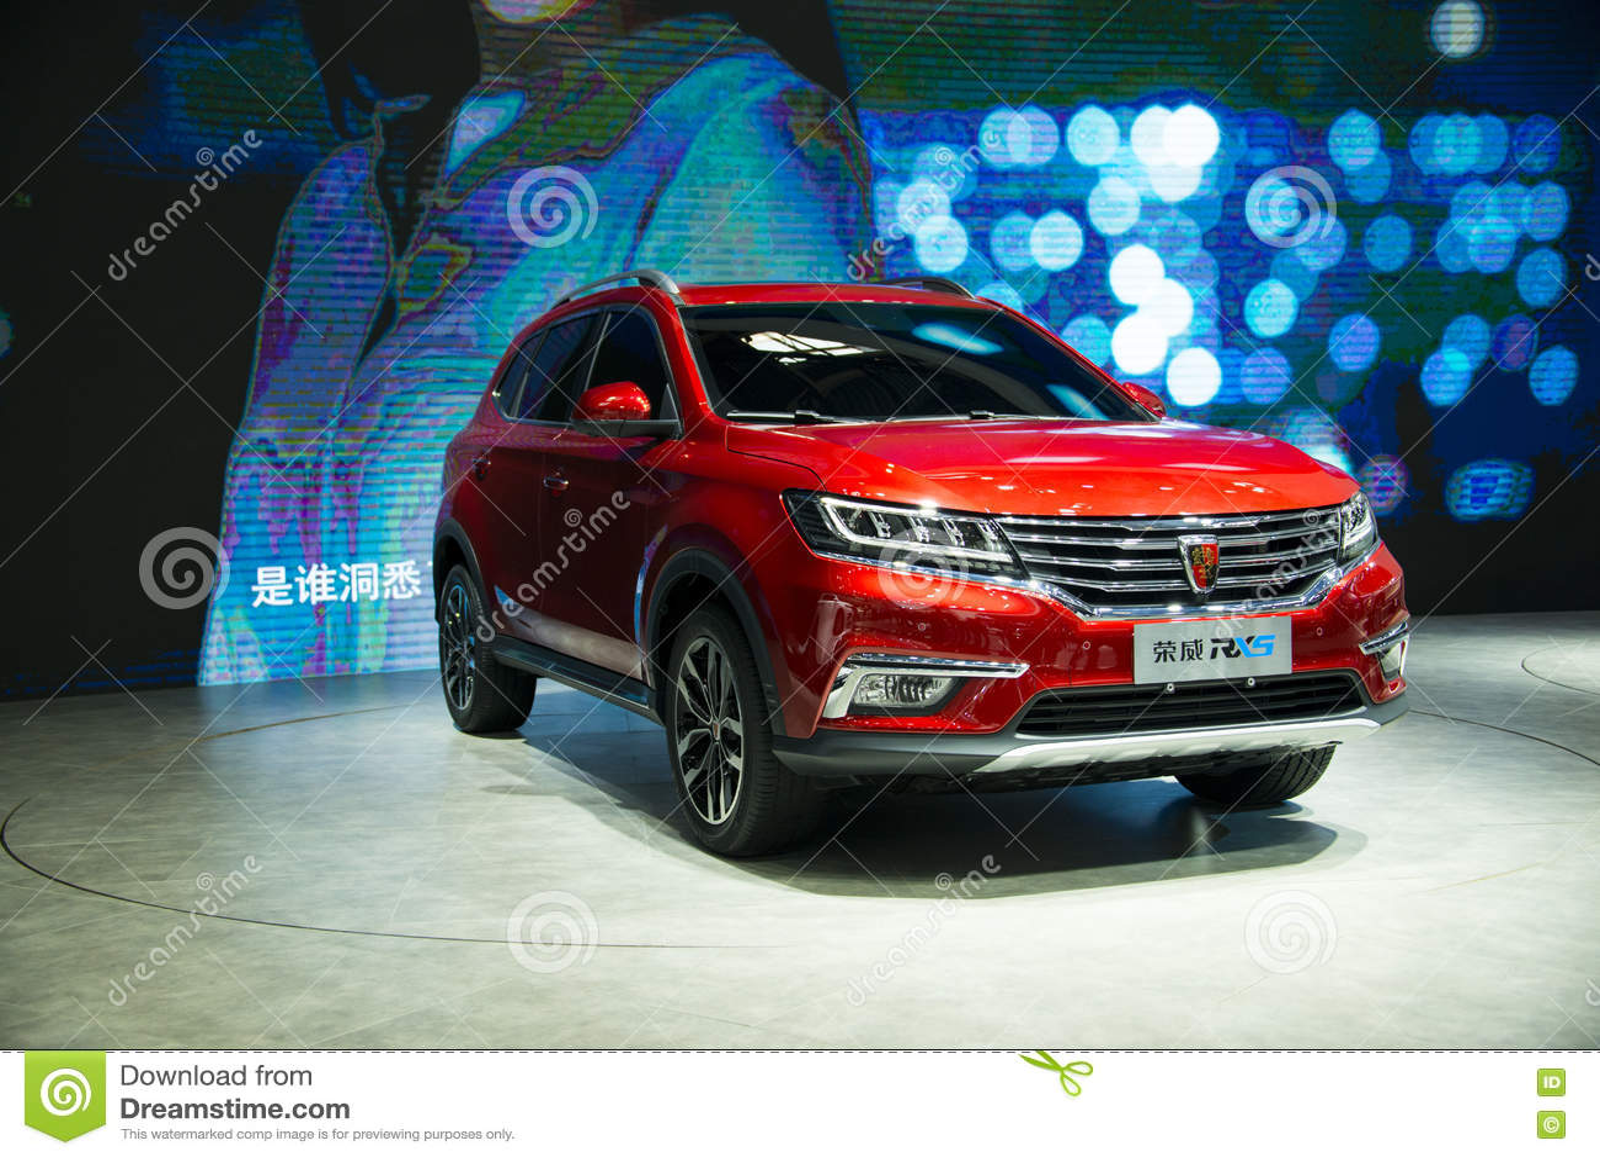 Asia China, Beijing, 2016 international automobile exhibition, Indoor exhibition hall,Internet car, Roewe SUV_RX5